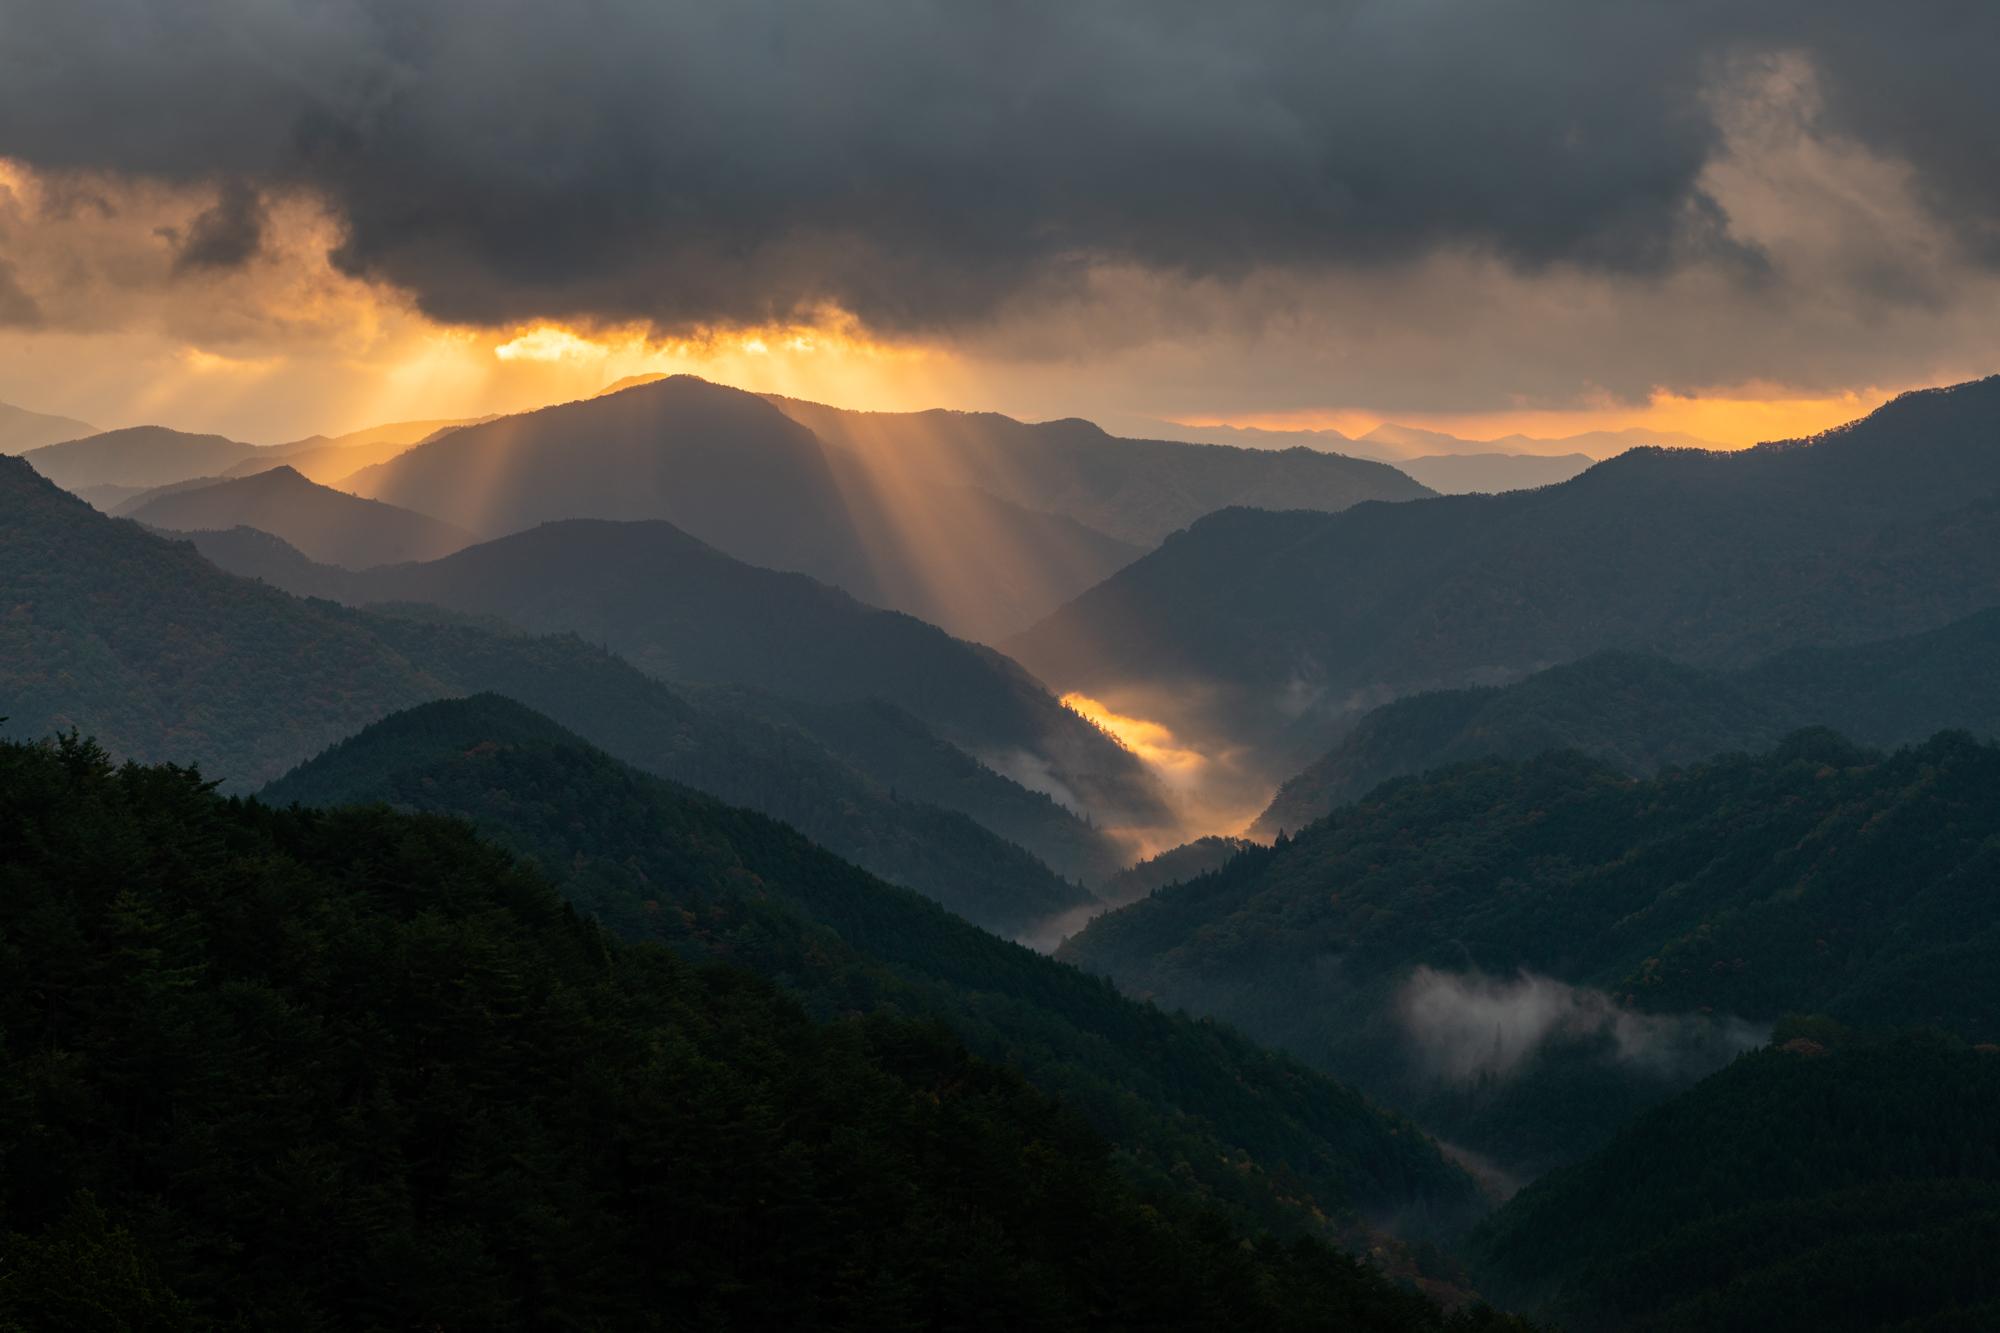 NIKON-CORPORATION_NIKON-D85020567 奈良県  野迫川村雲海スポット(雲海や朝日の光芒が見れる秋におすすめの絶景スポット! 撮影した写真の紹介、アクセス情報など)